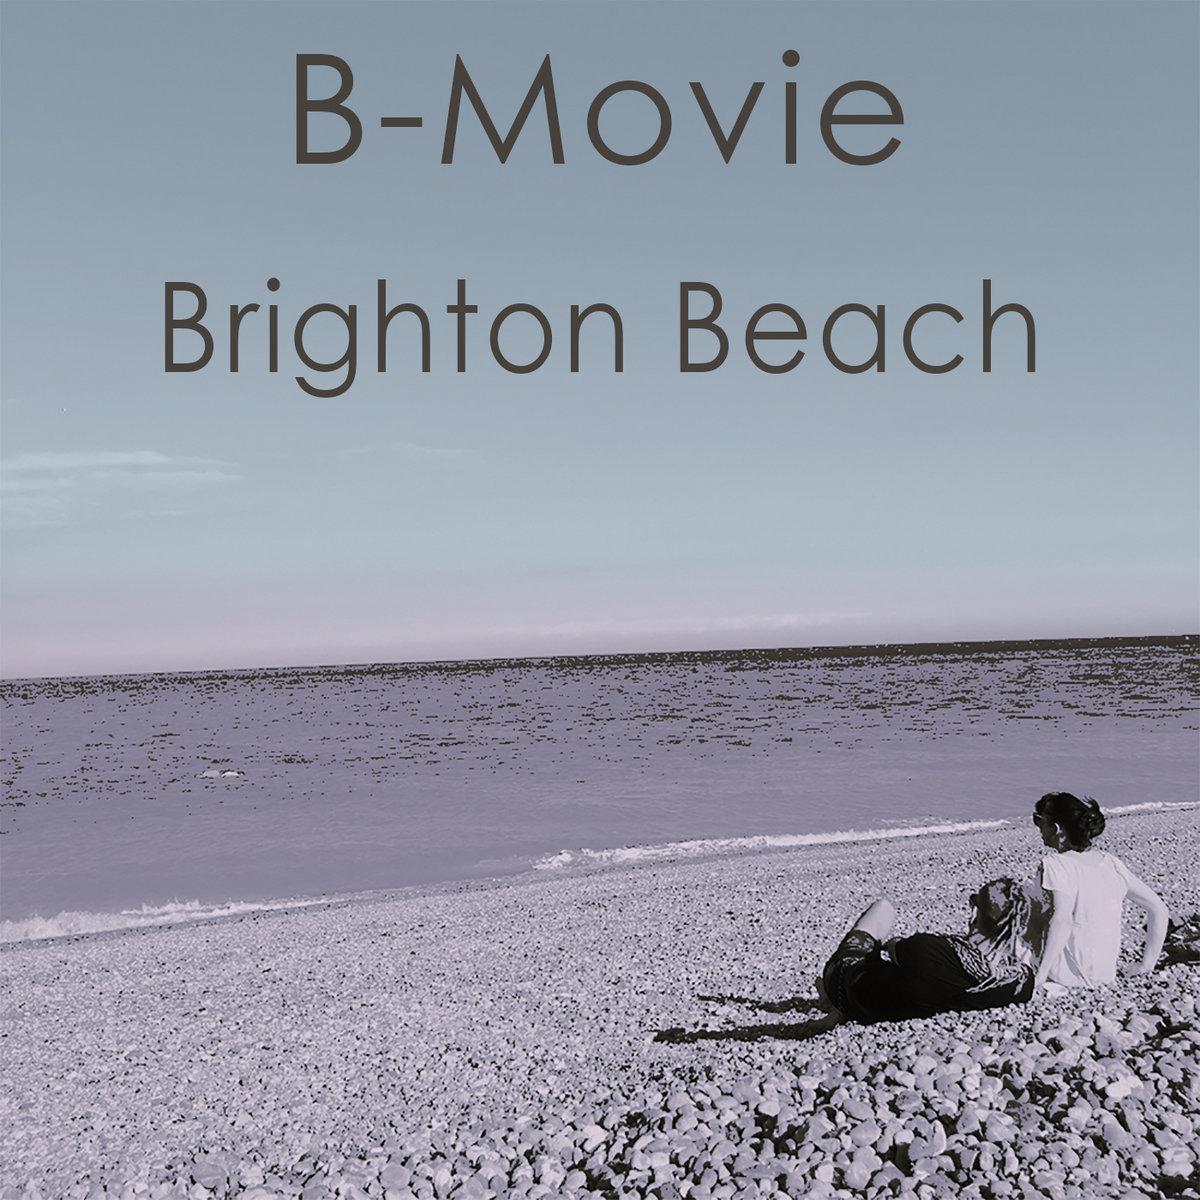 Brèves – B-Movie, The Chills, Tame Impala